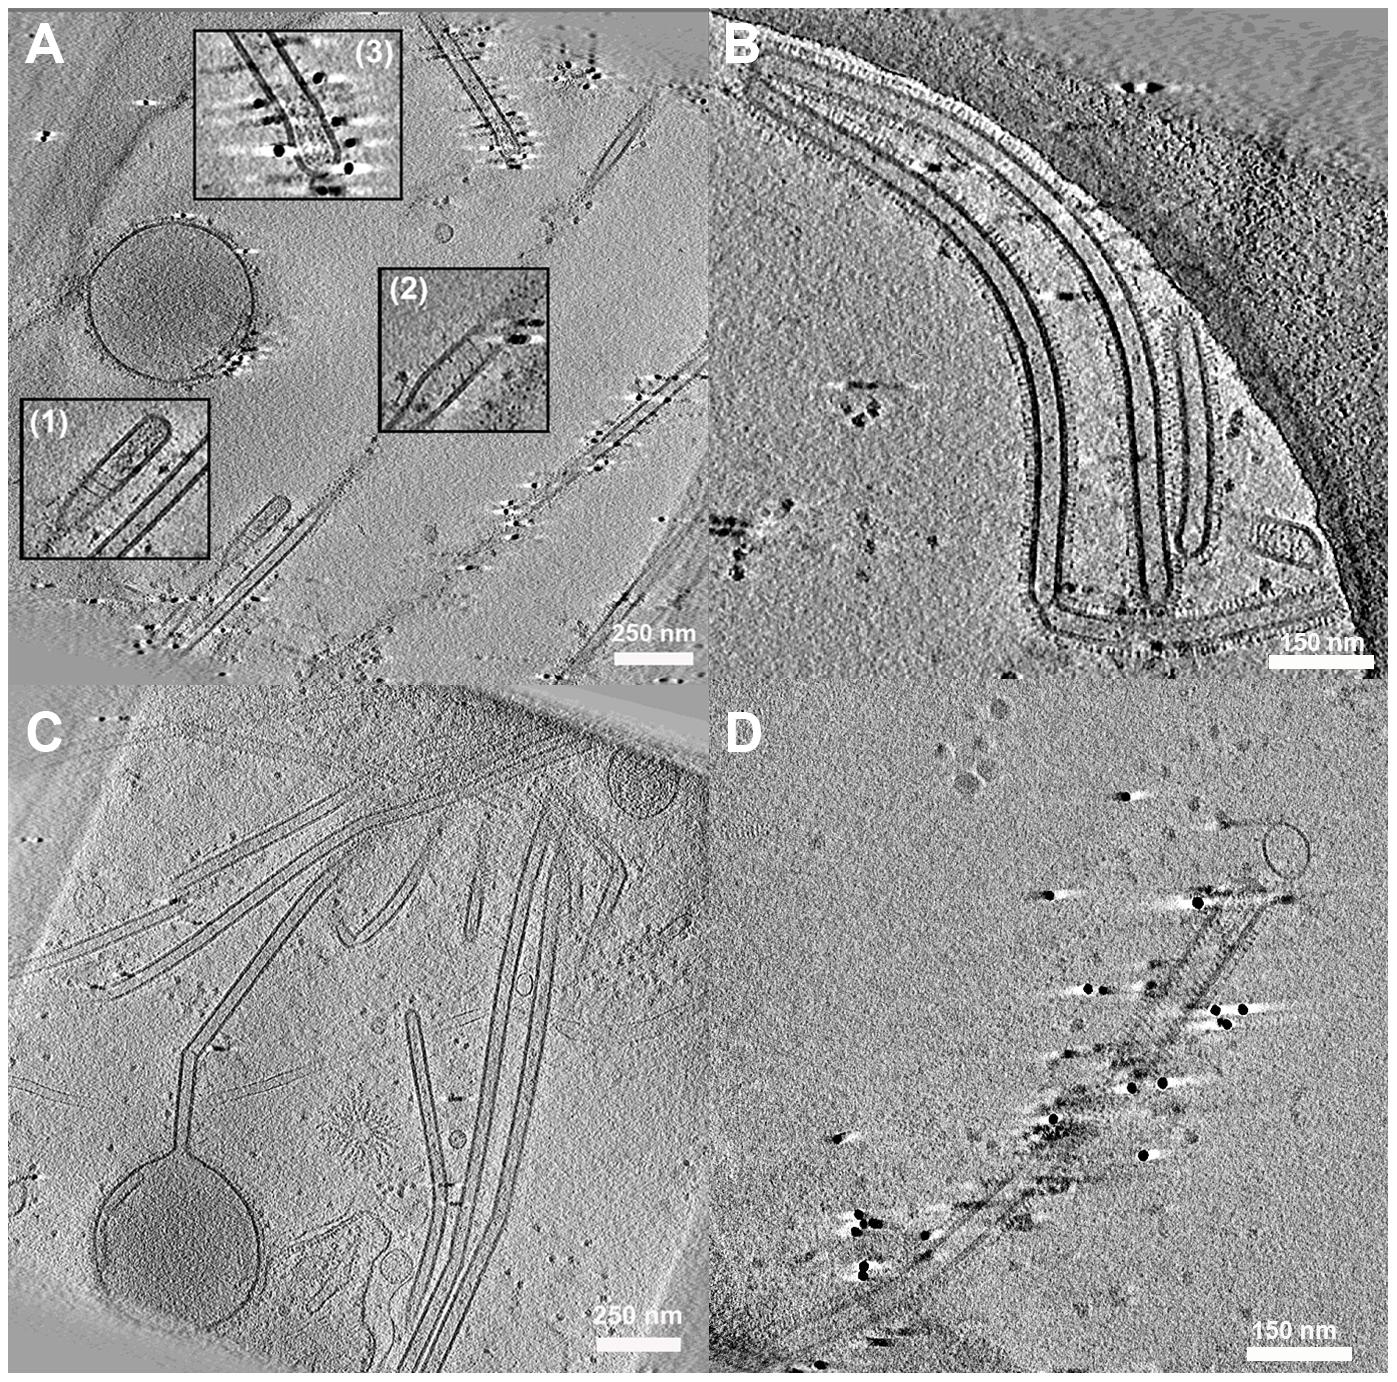 Cell associated long filamentous structures.